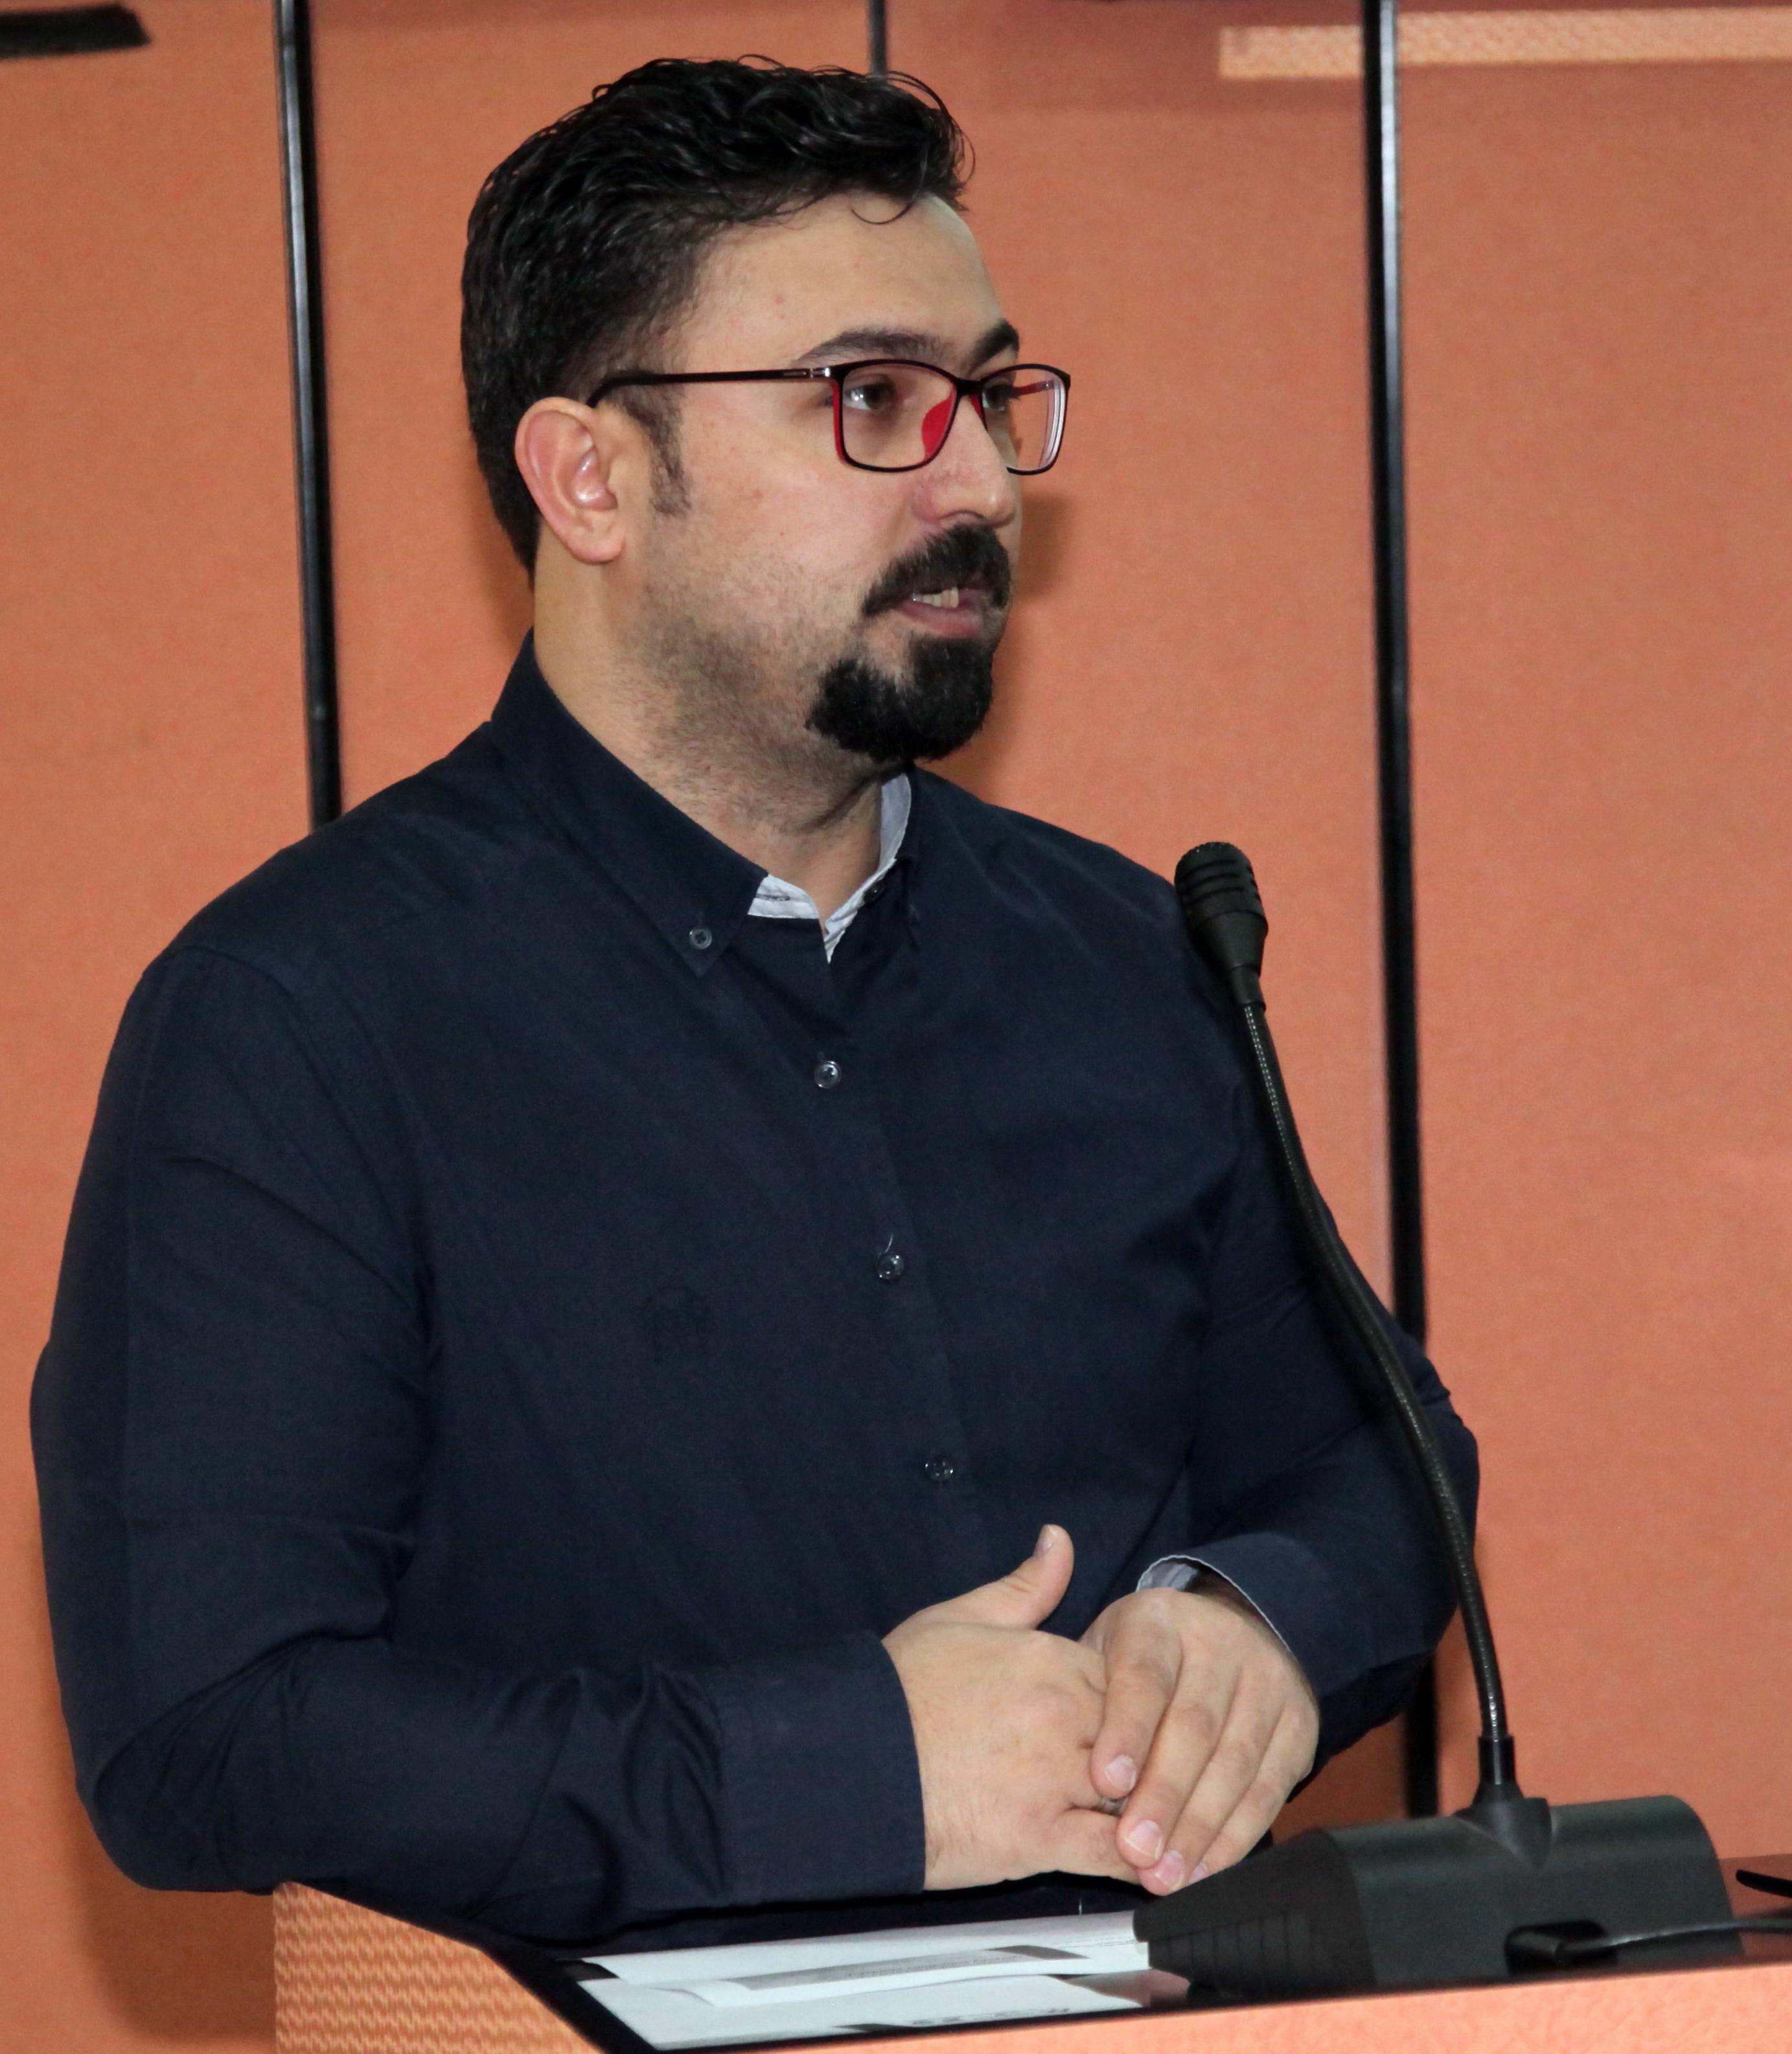 Fatih Balcı